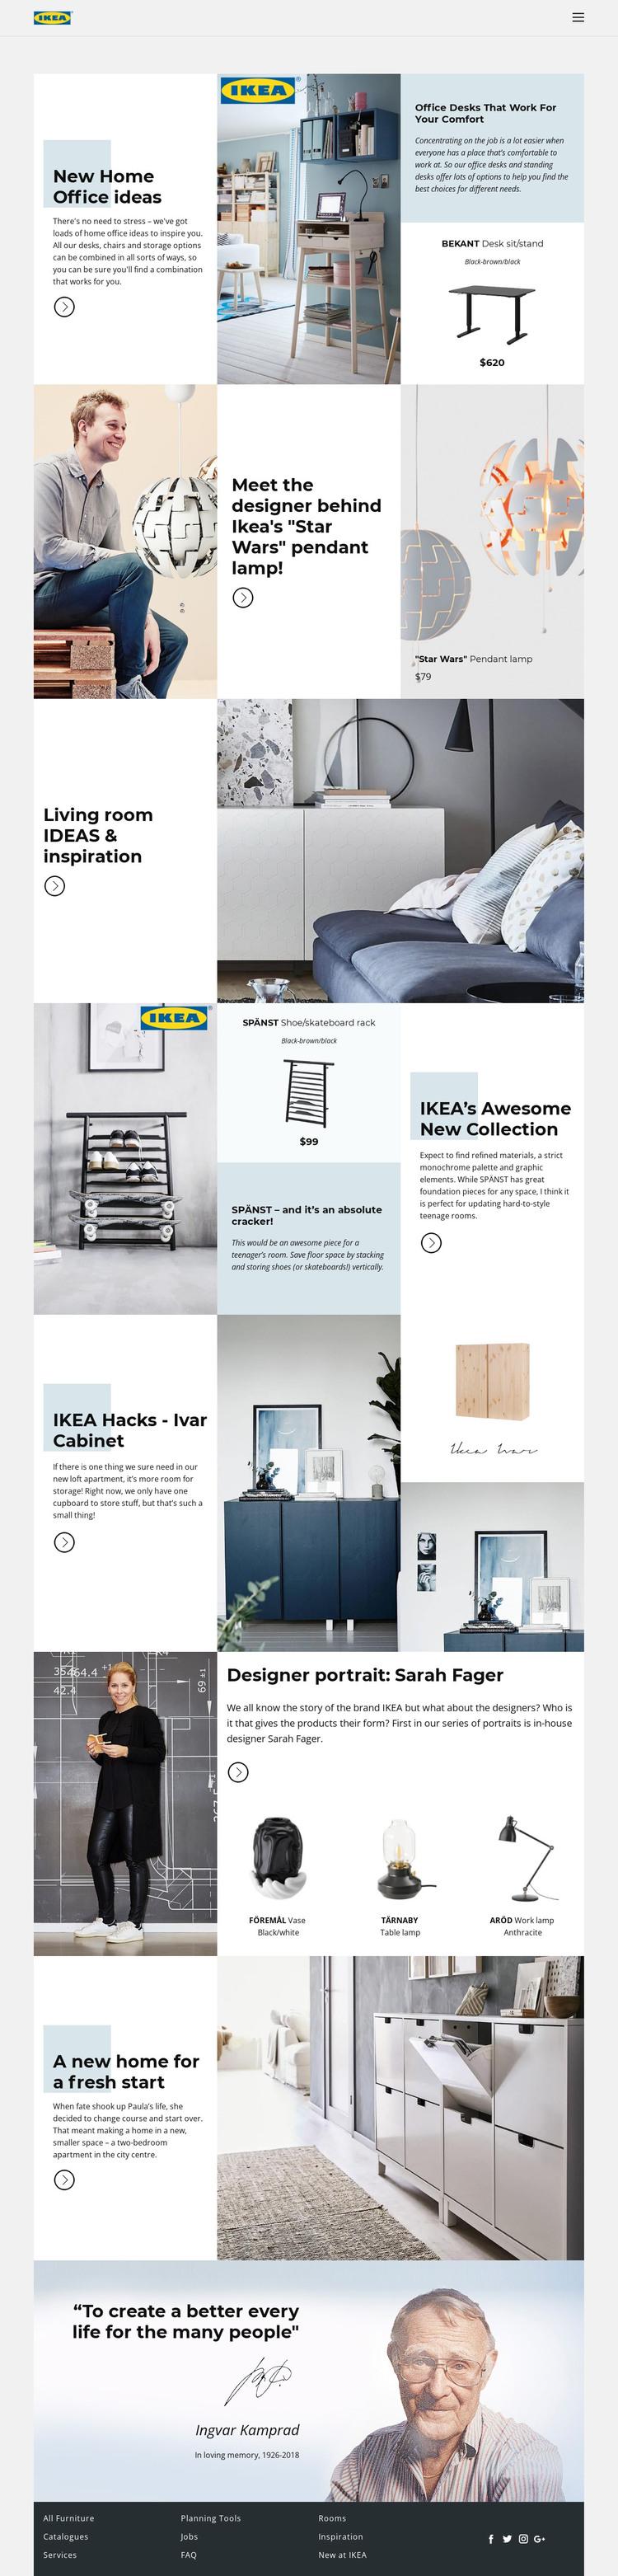 Inspiration from IKEA Web Design